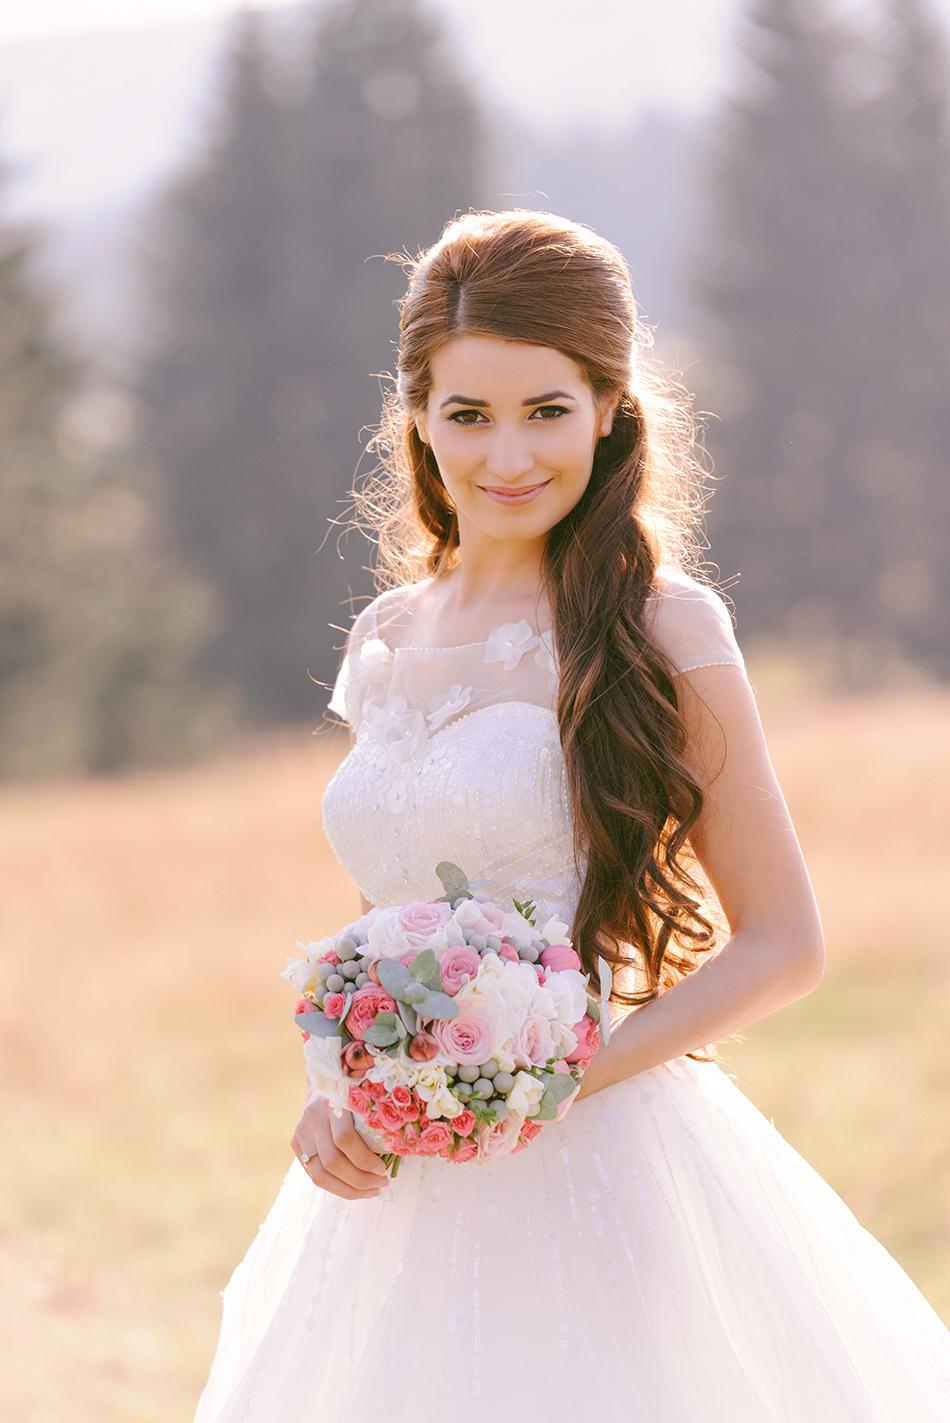 AD Passion Photography | fotograf-nunta-brasov-poiana-brasov-fotograf-profesionist_lorena-cristi_0096 | Adelin, Dida, fotograf profesionist, fotograf de nunta, fotografie de nunta, fotograf Timisoara, fotograf Craiova, fotograf Bucuresti, fotograf Arad, nunta Timisoara, nunta Arad, nunta Bucuresti, nunta Craiova